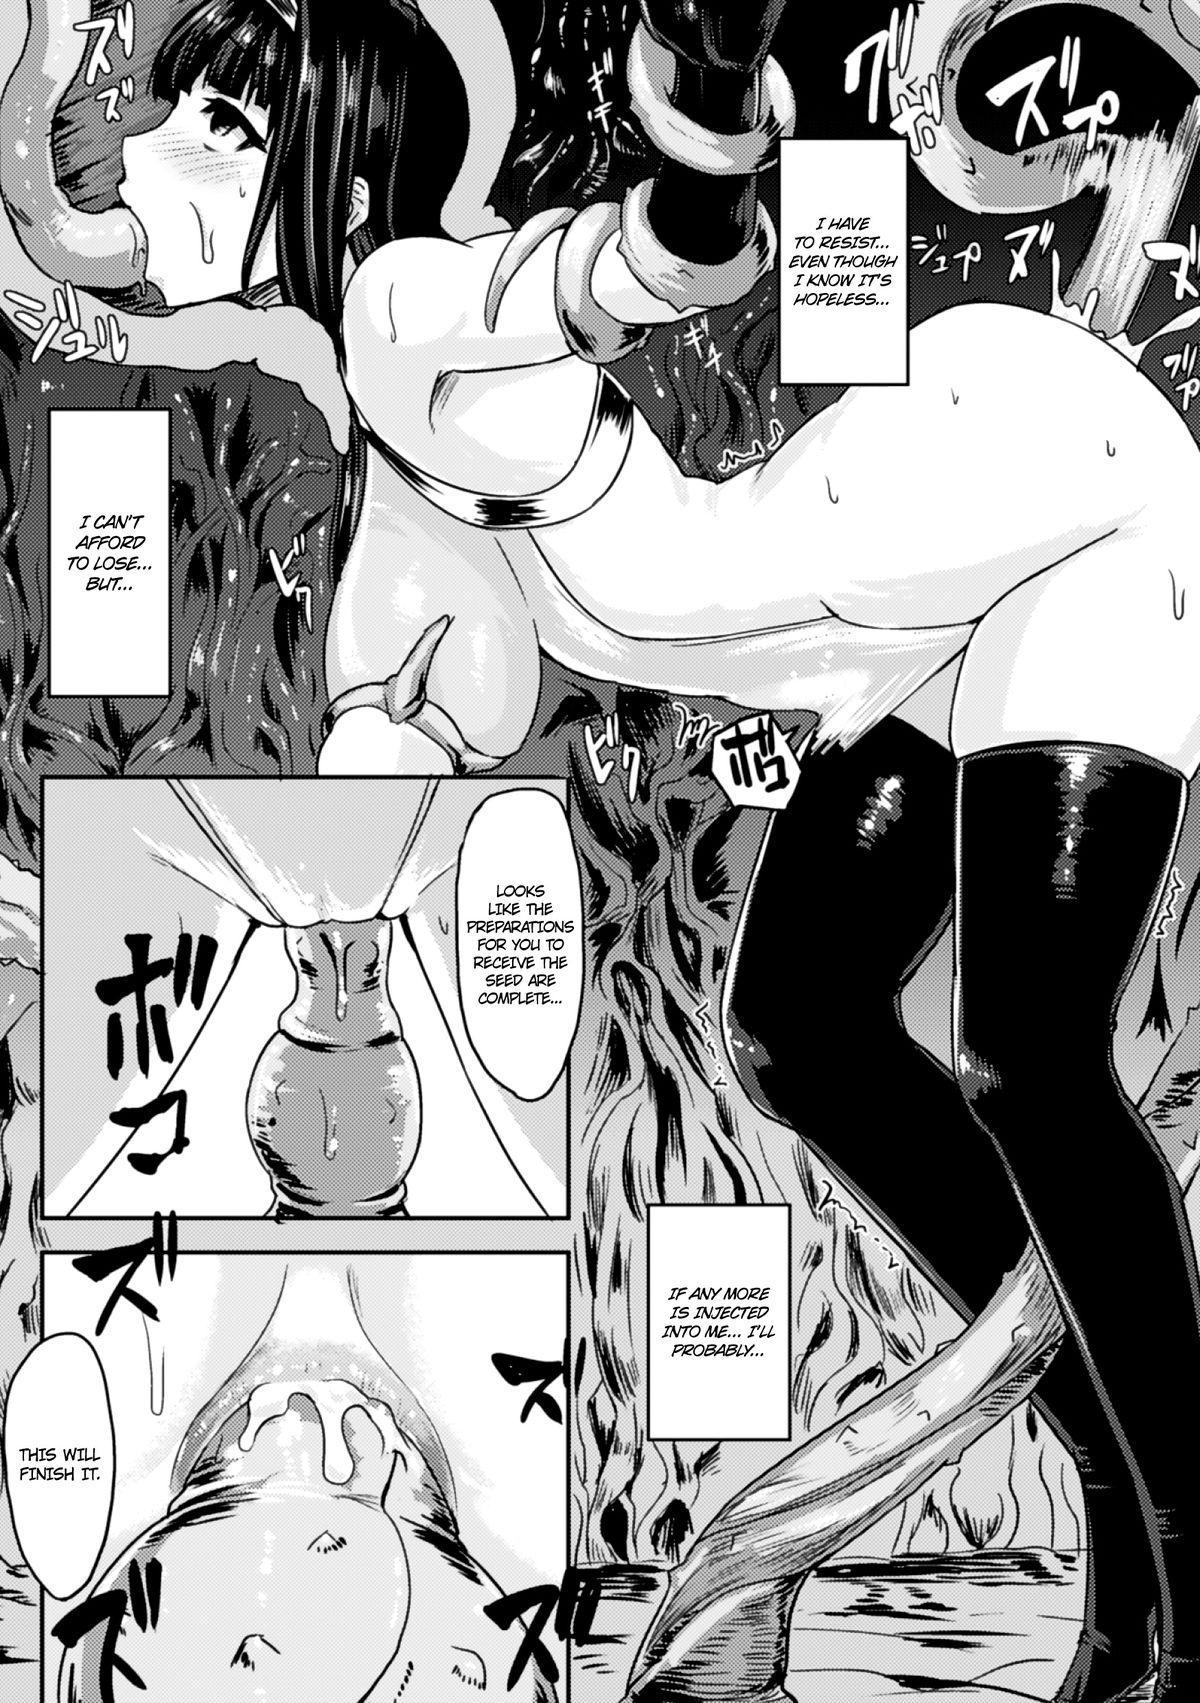 2D Comic Magazine Shokubutsukan de Monzetsu Acme Saki! Vol. 2 22